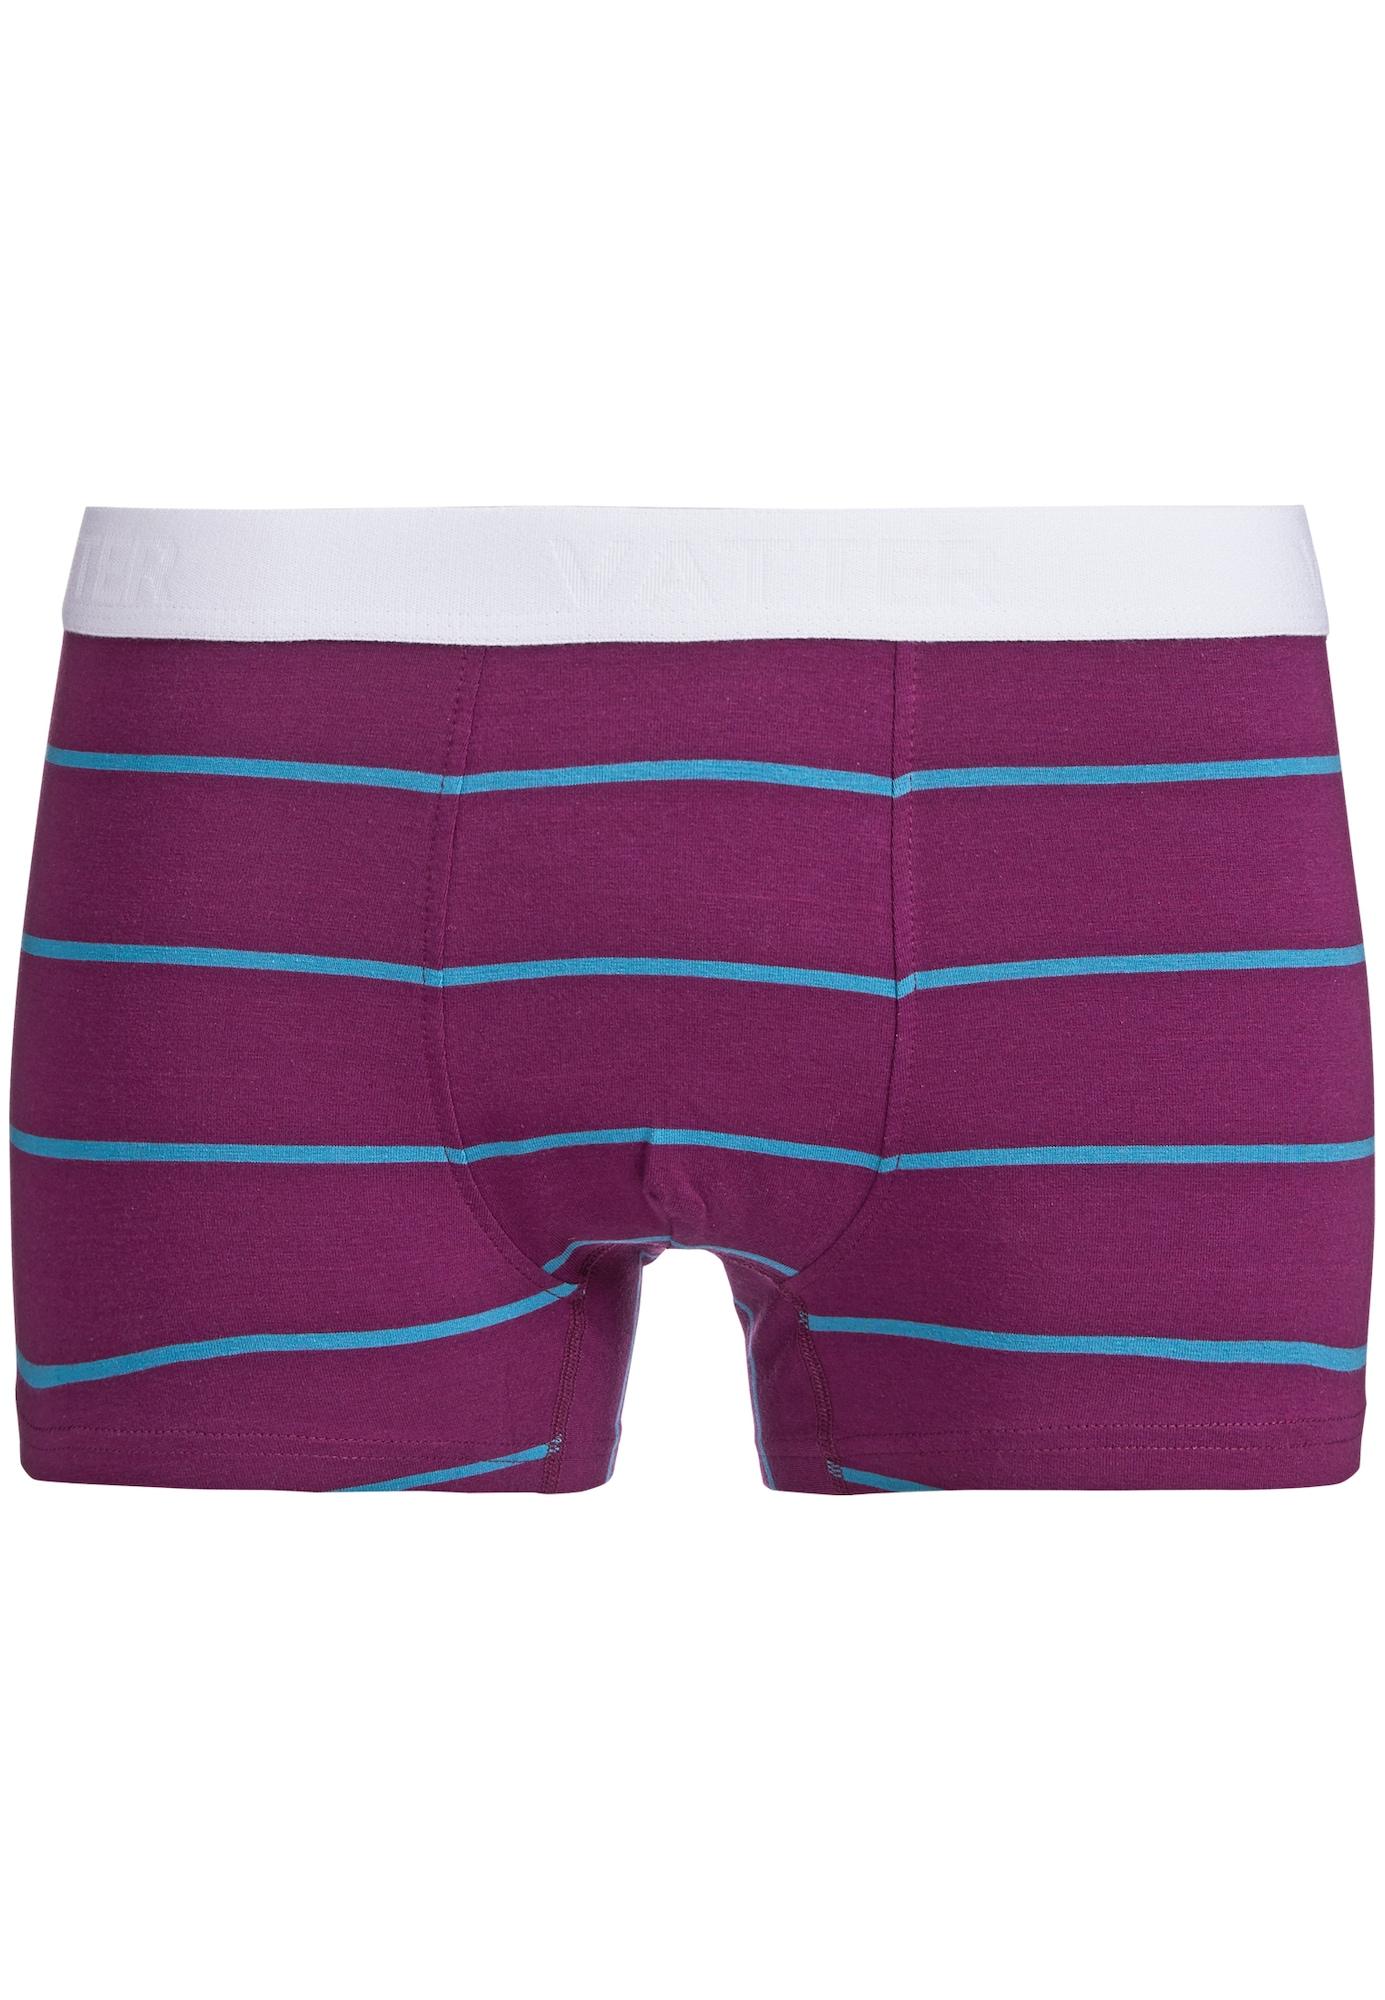 'Tight Tim' Trunk Short   Sportbekleidung > Sporthosen > Tights   VATTER